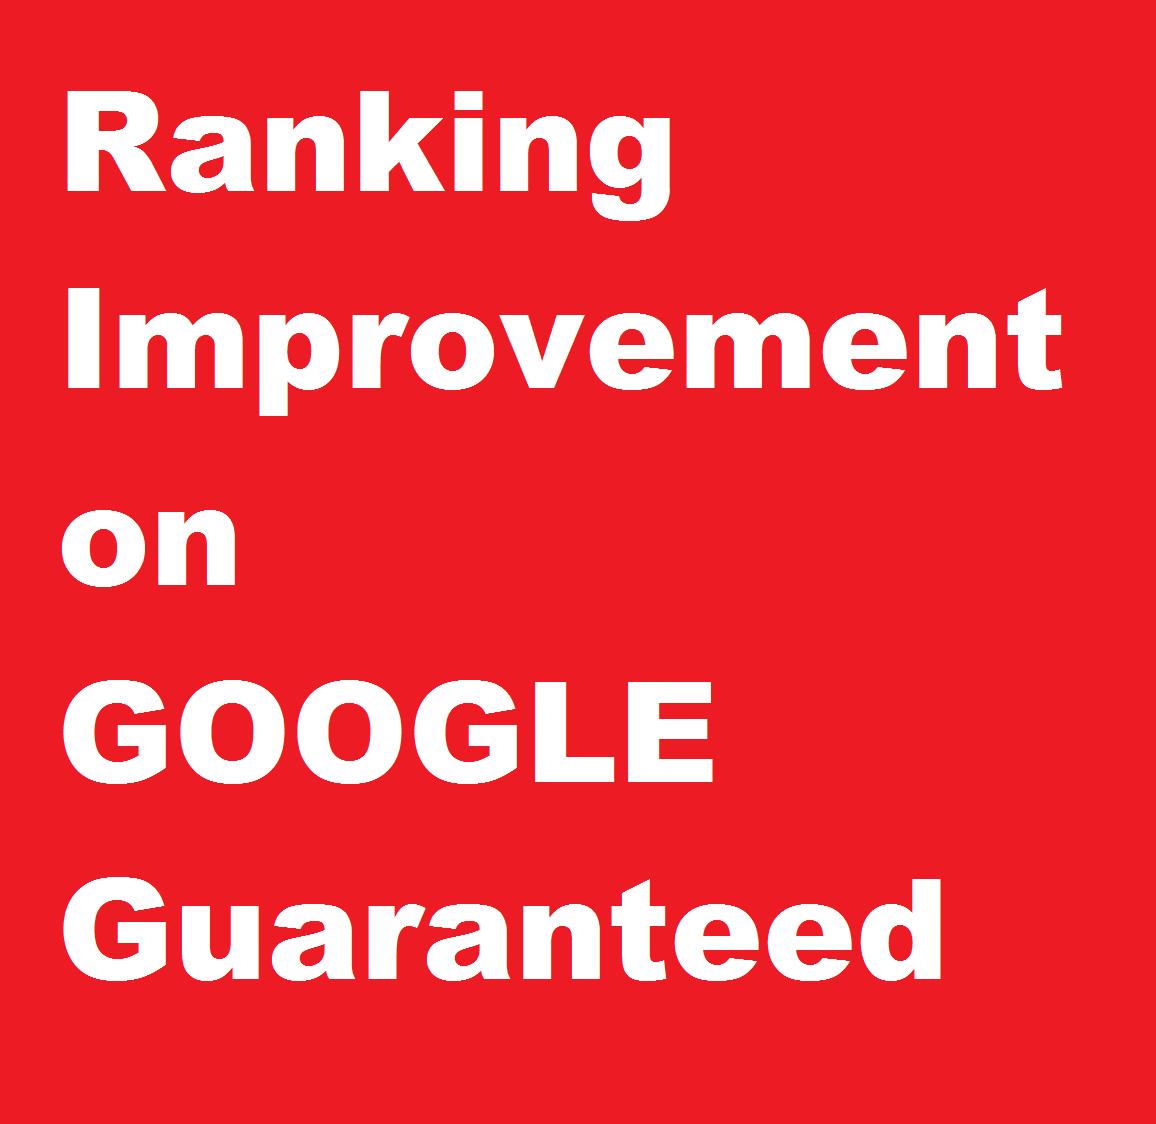 google seo ranking,  Guaranteed Ranking Improvement on google in 4 weeks,  link building service